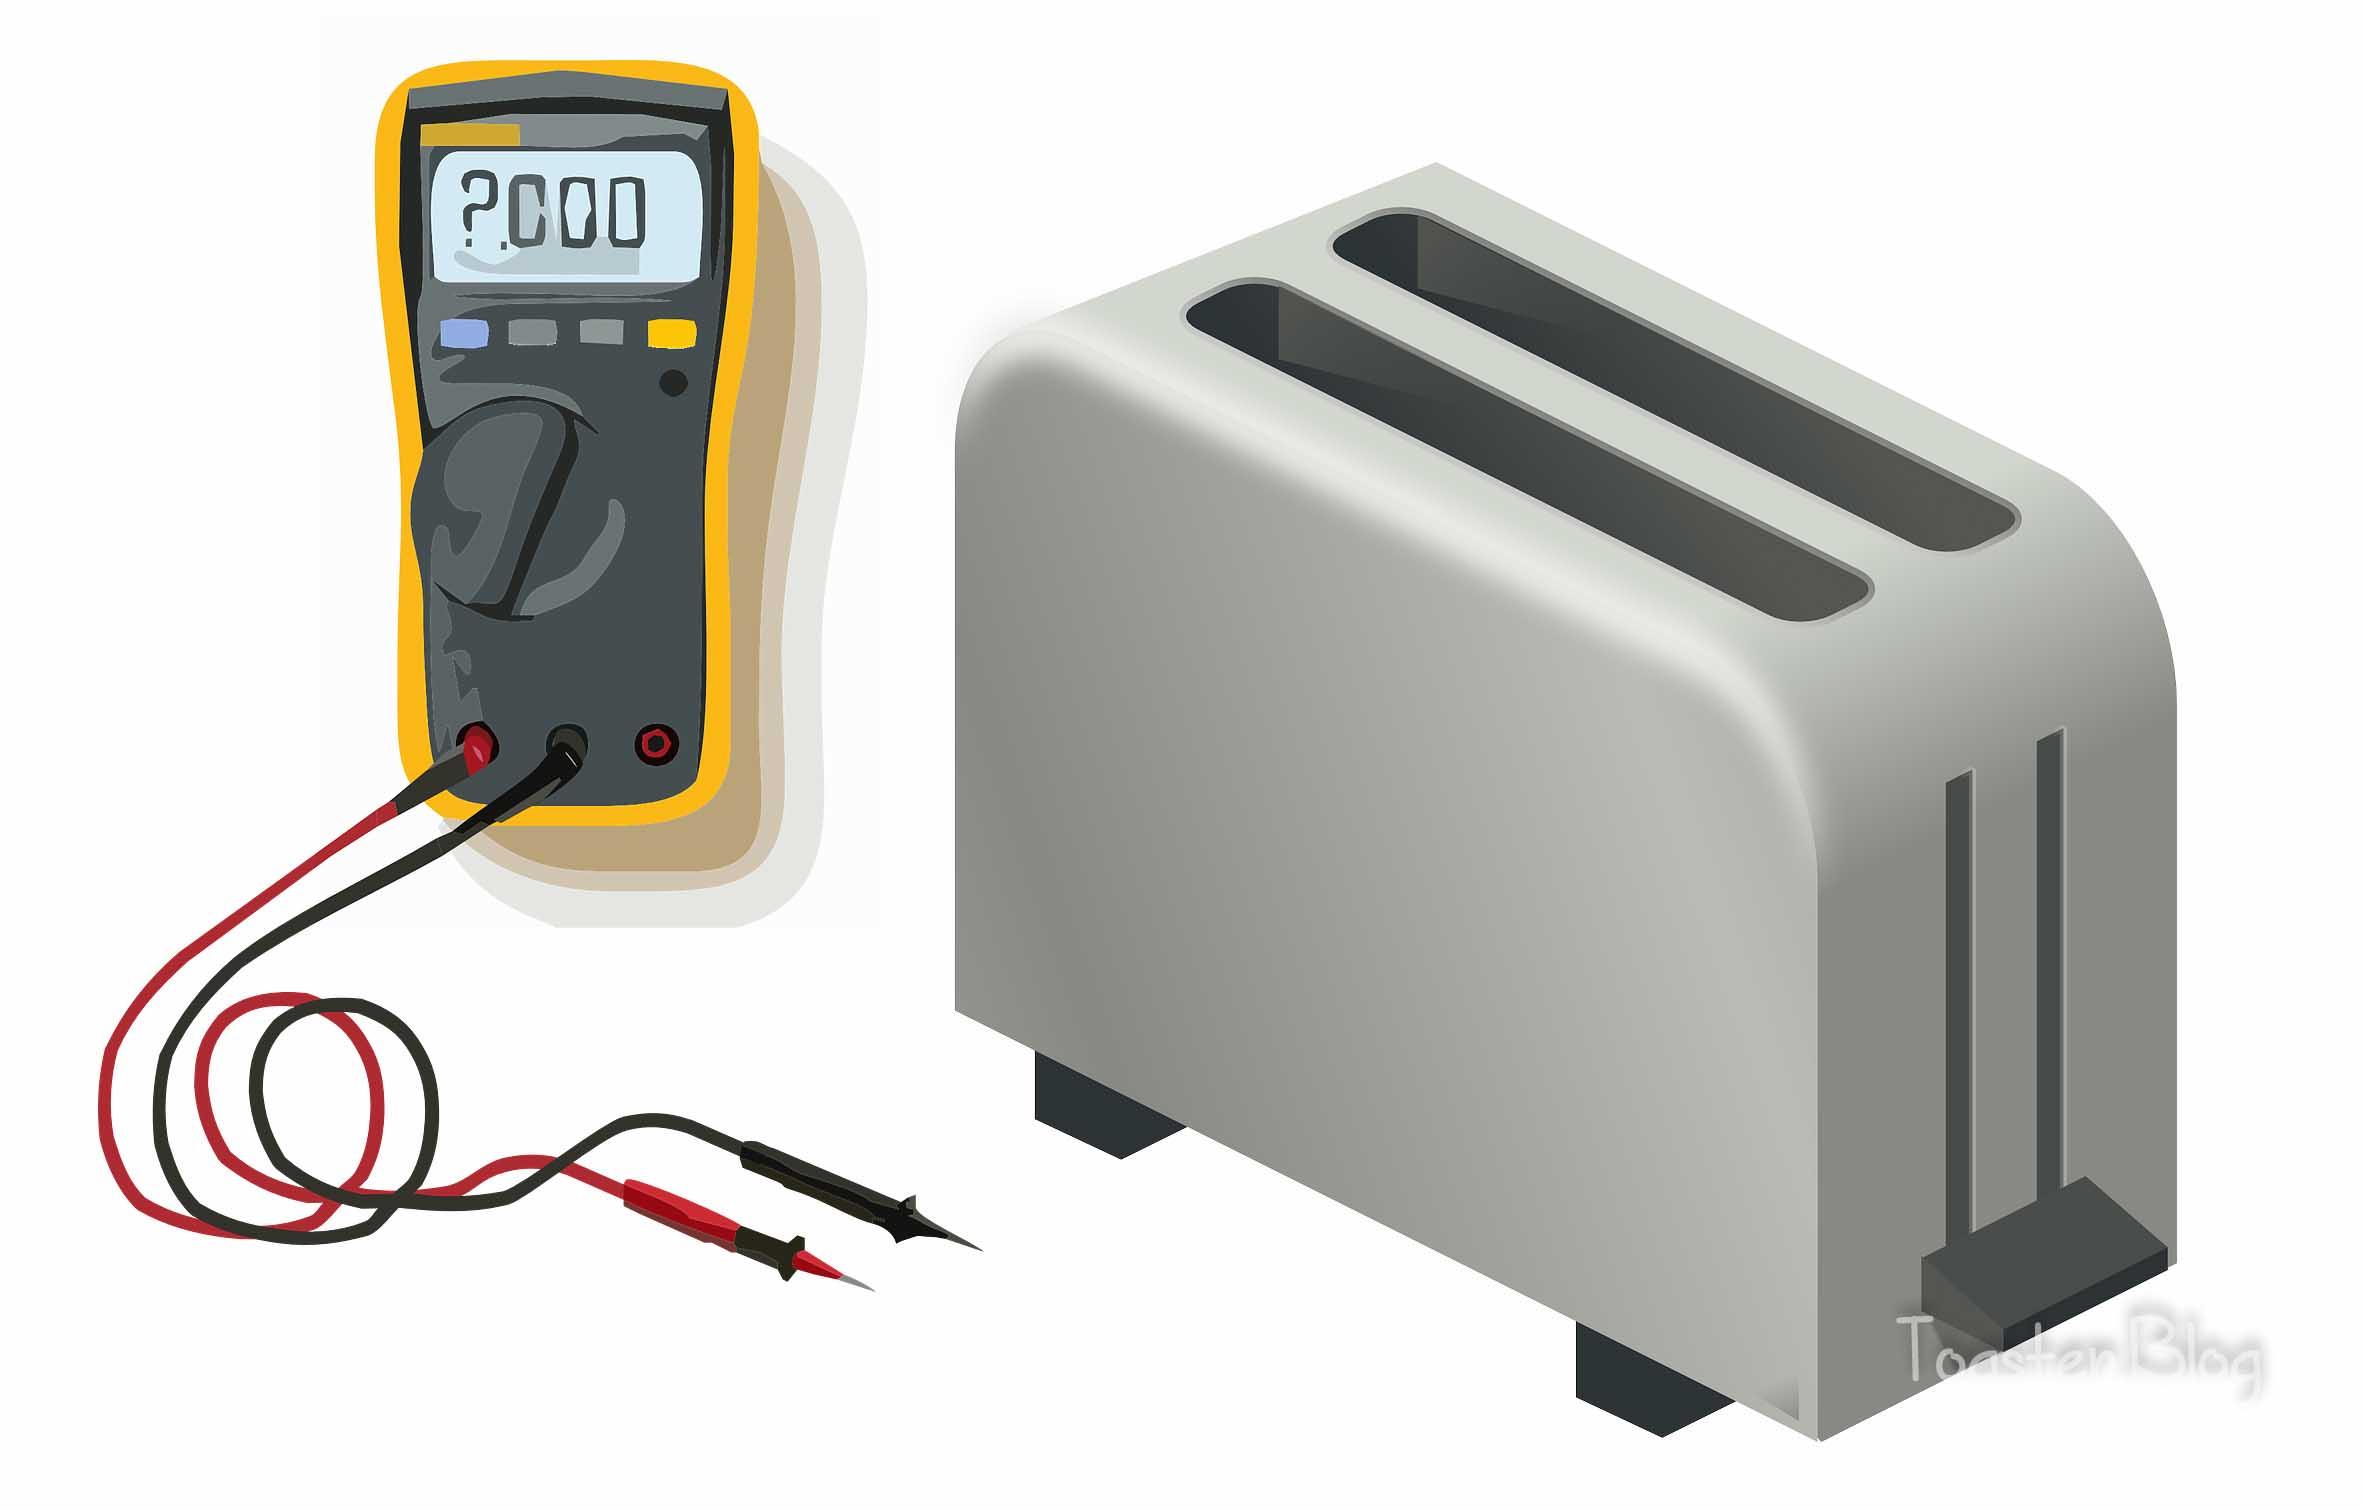 How many watts does a toaster use